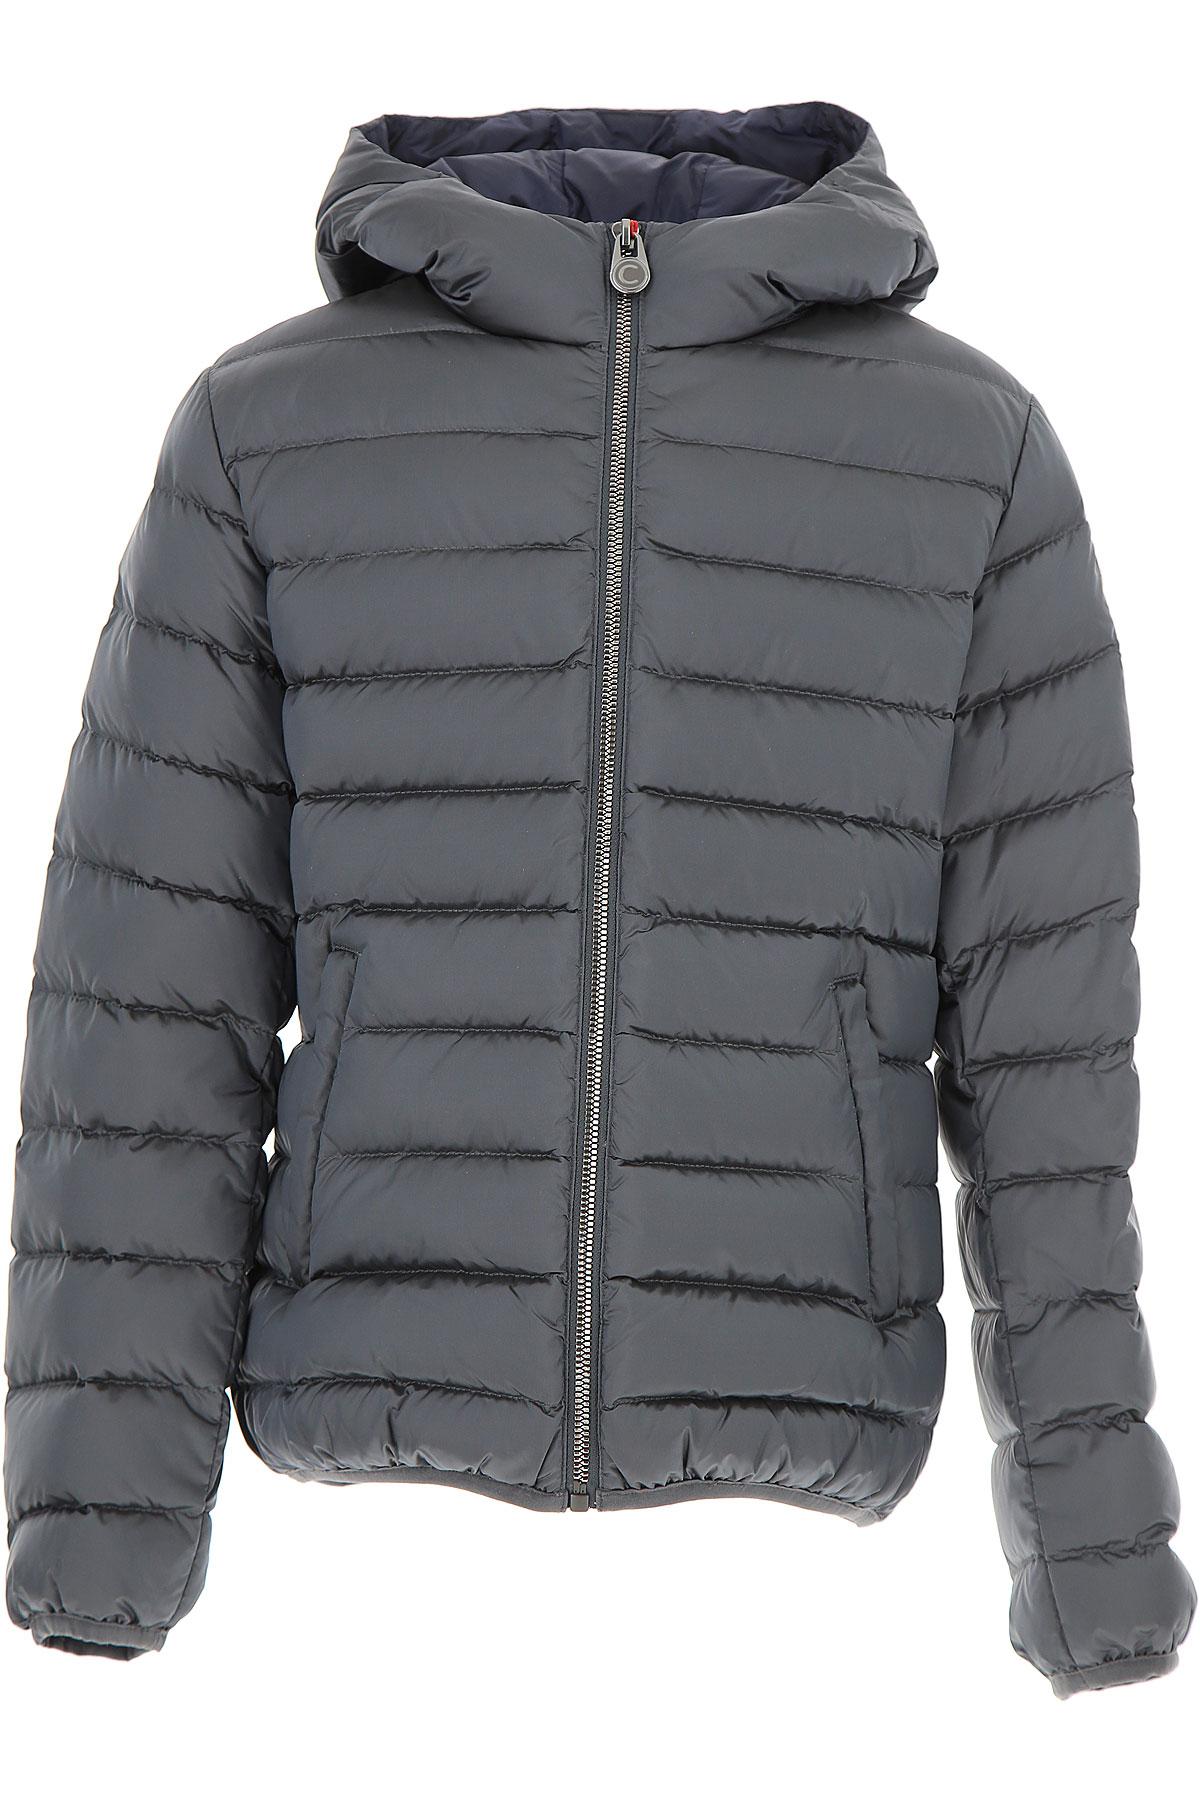 Image of Colmar Boys Down Jacket for Kids, Puffer Ski Jacket On Sale in Outlet, Avio Grey, polyamide, 2017, 10Y 6Y